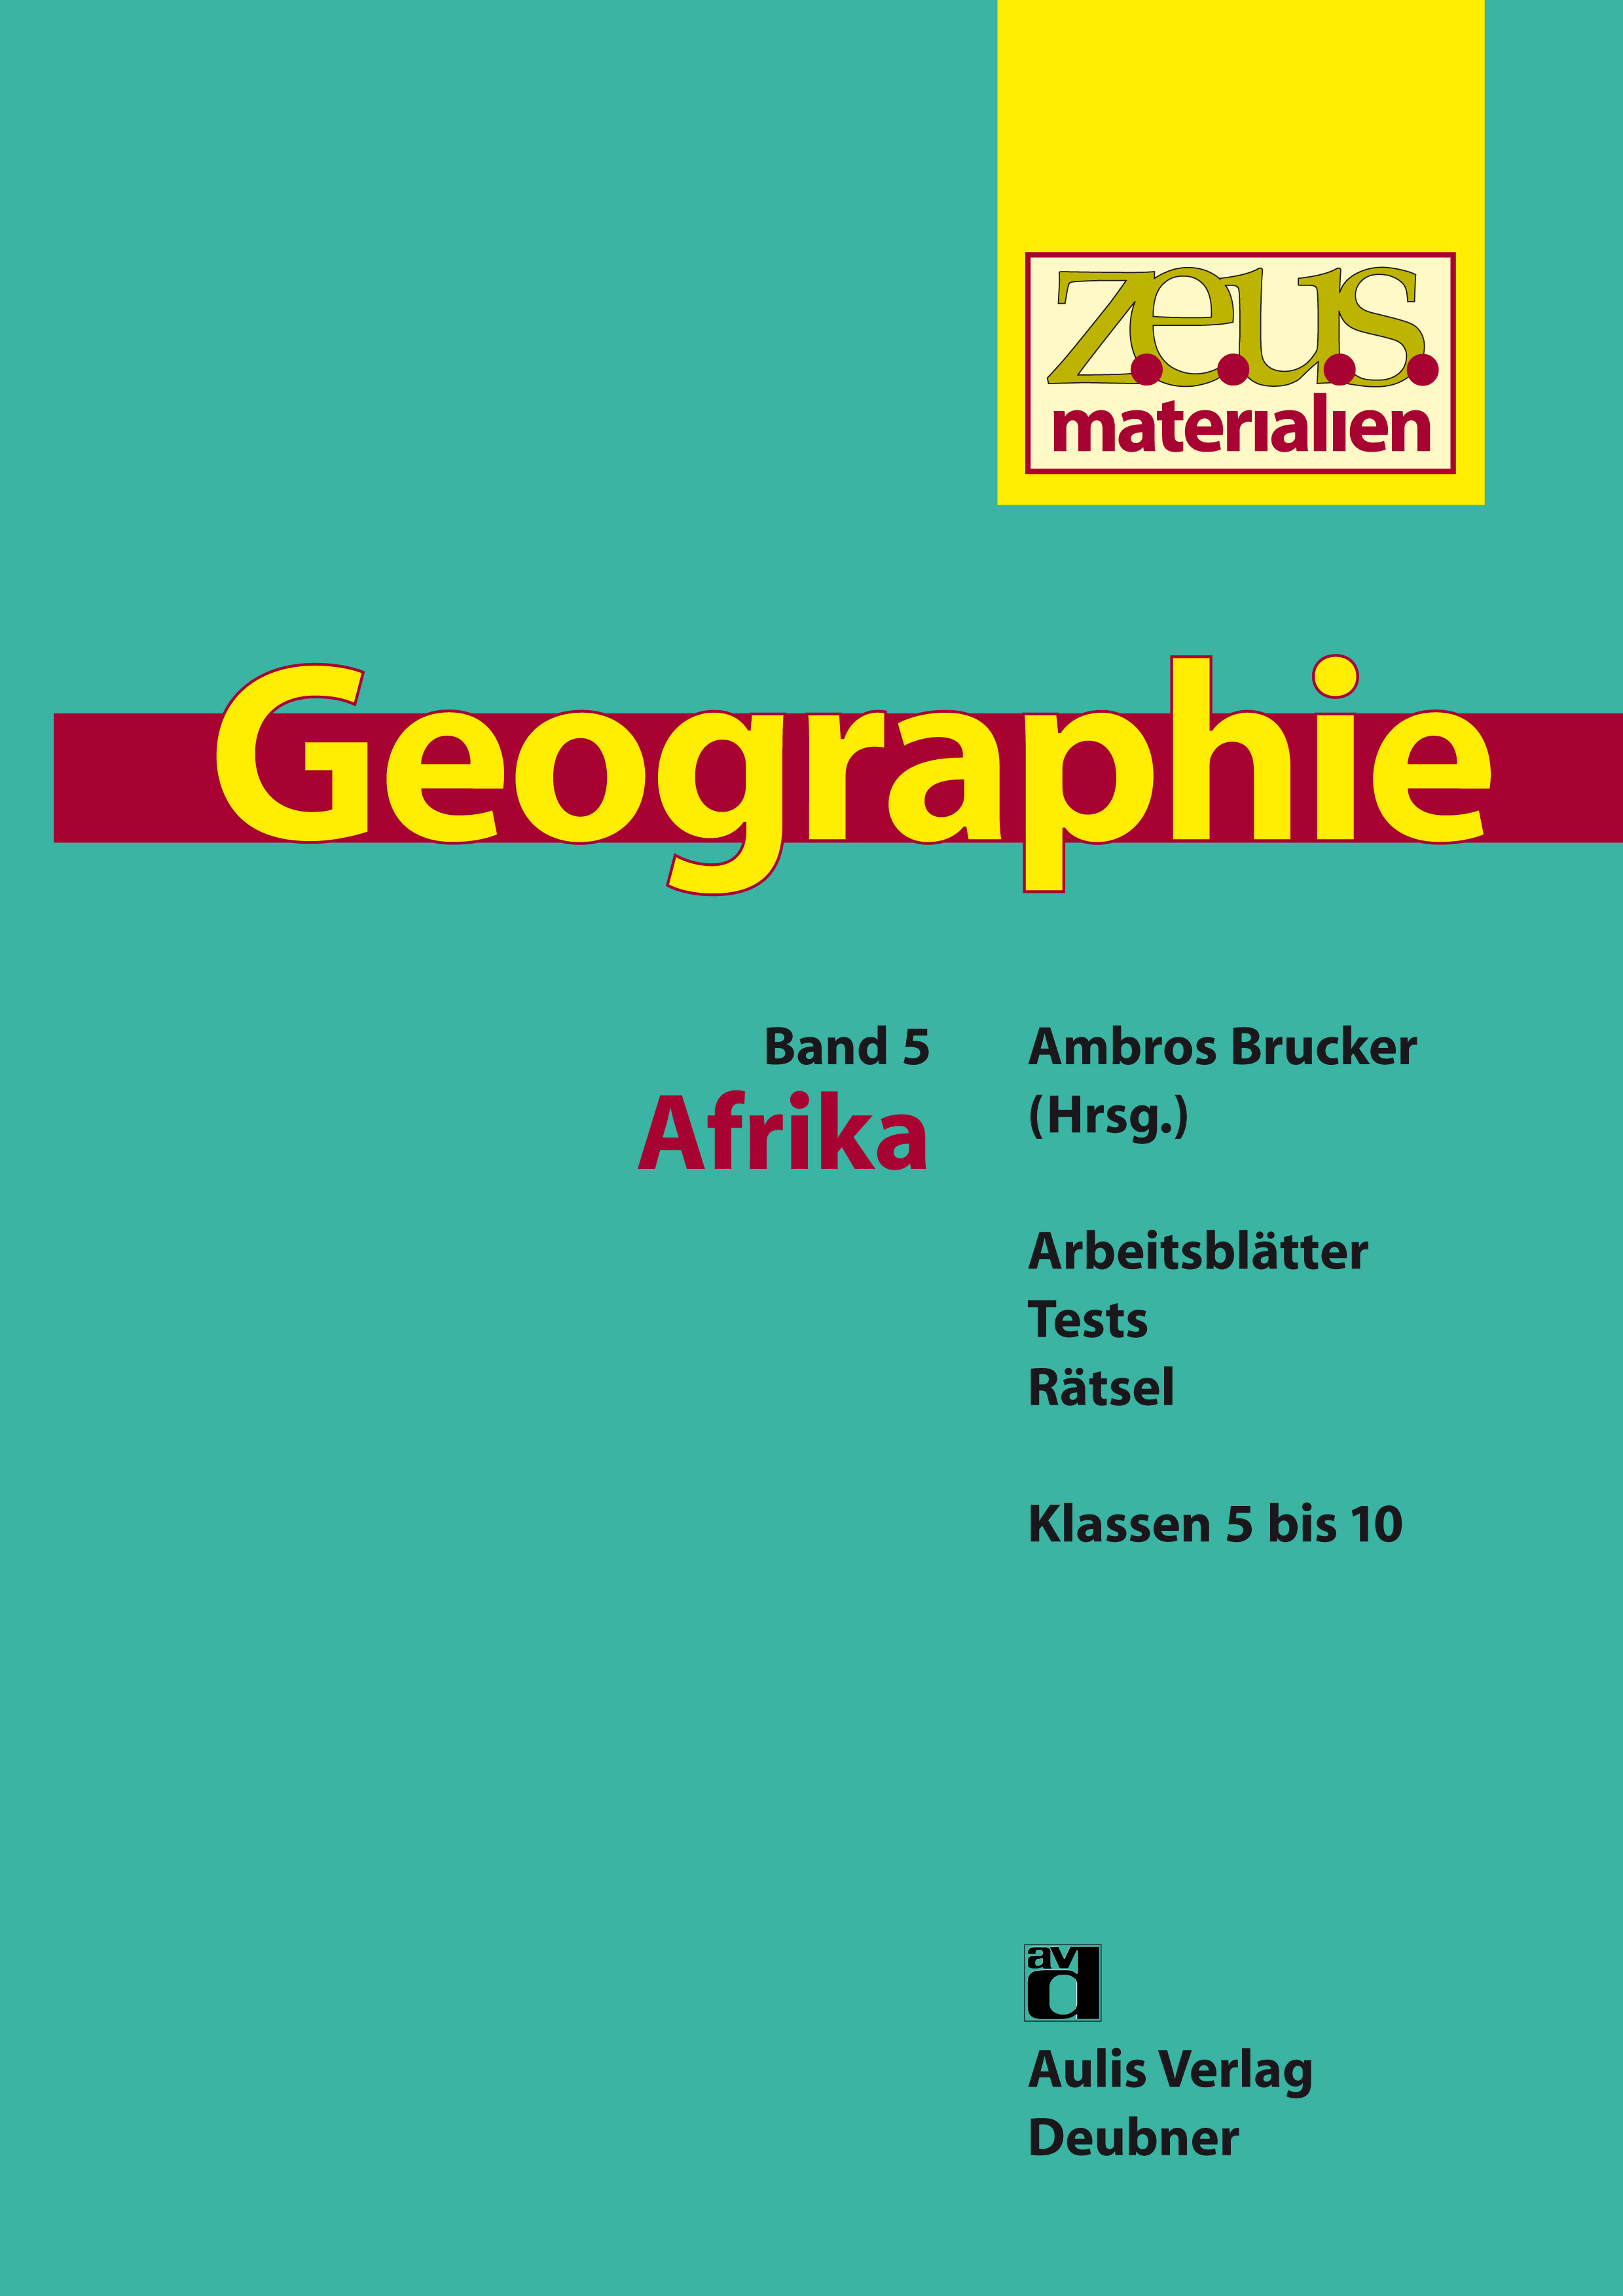 z.e.u.s. Materialien Geographie-Buchreihe – Band 5: Afrika